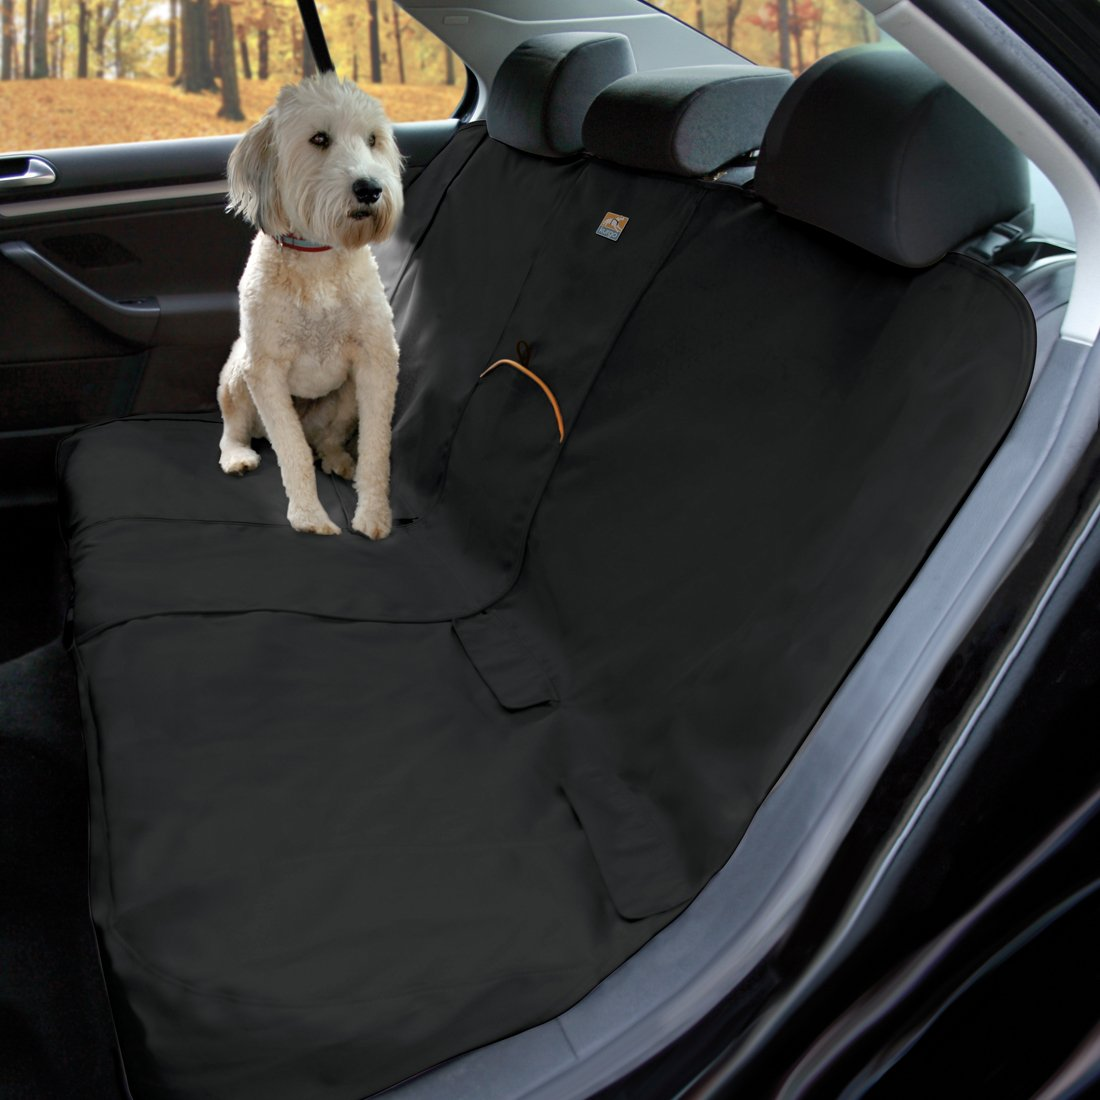 Kurgo Bench Seat Cover in Black